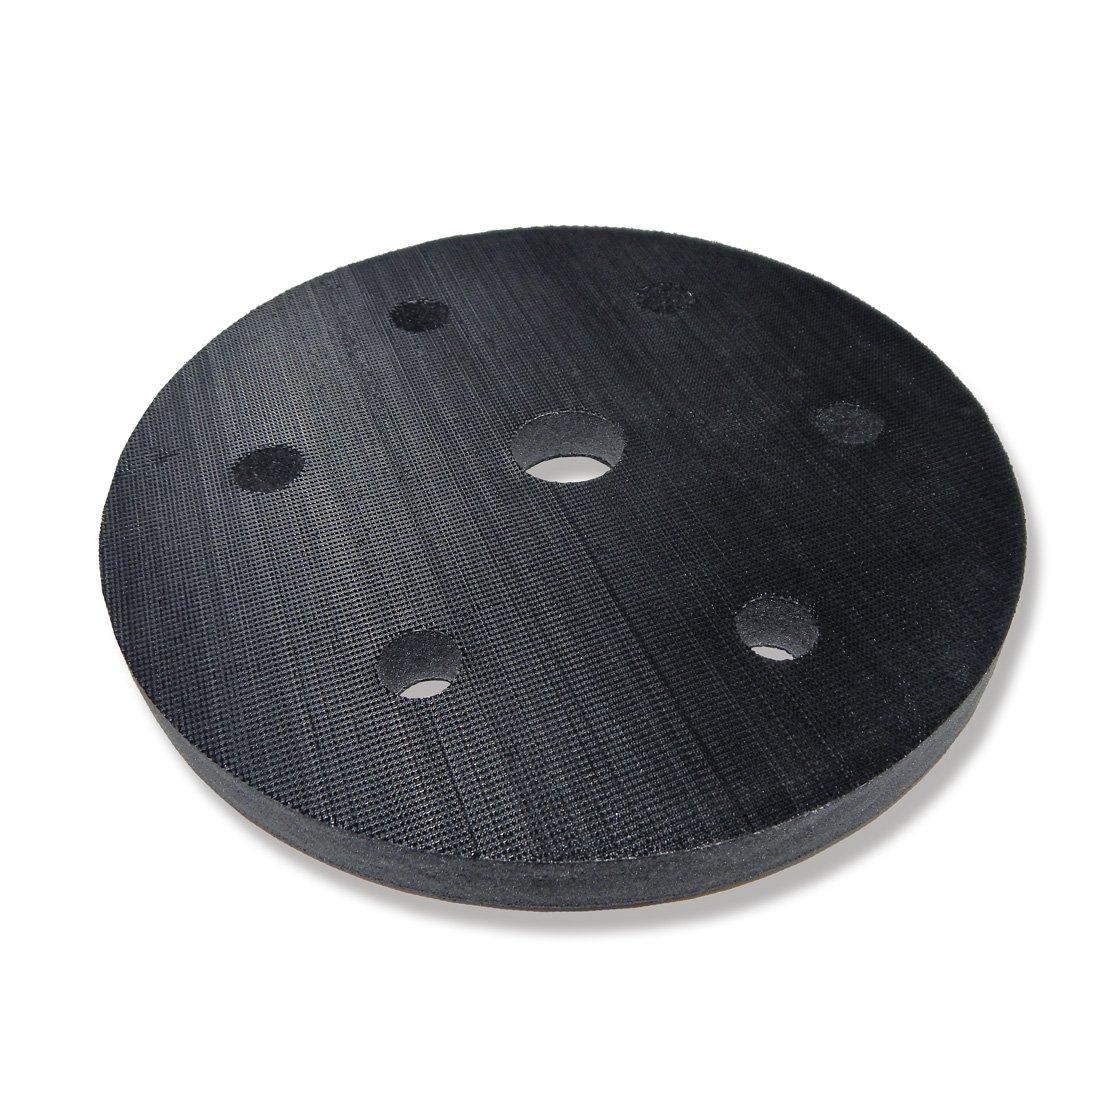 for all MENZER Drywall Sander Hook /& loop backing pad 225mm, soft